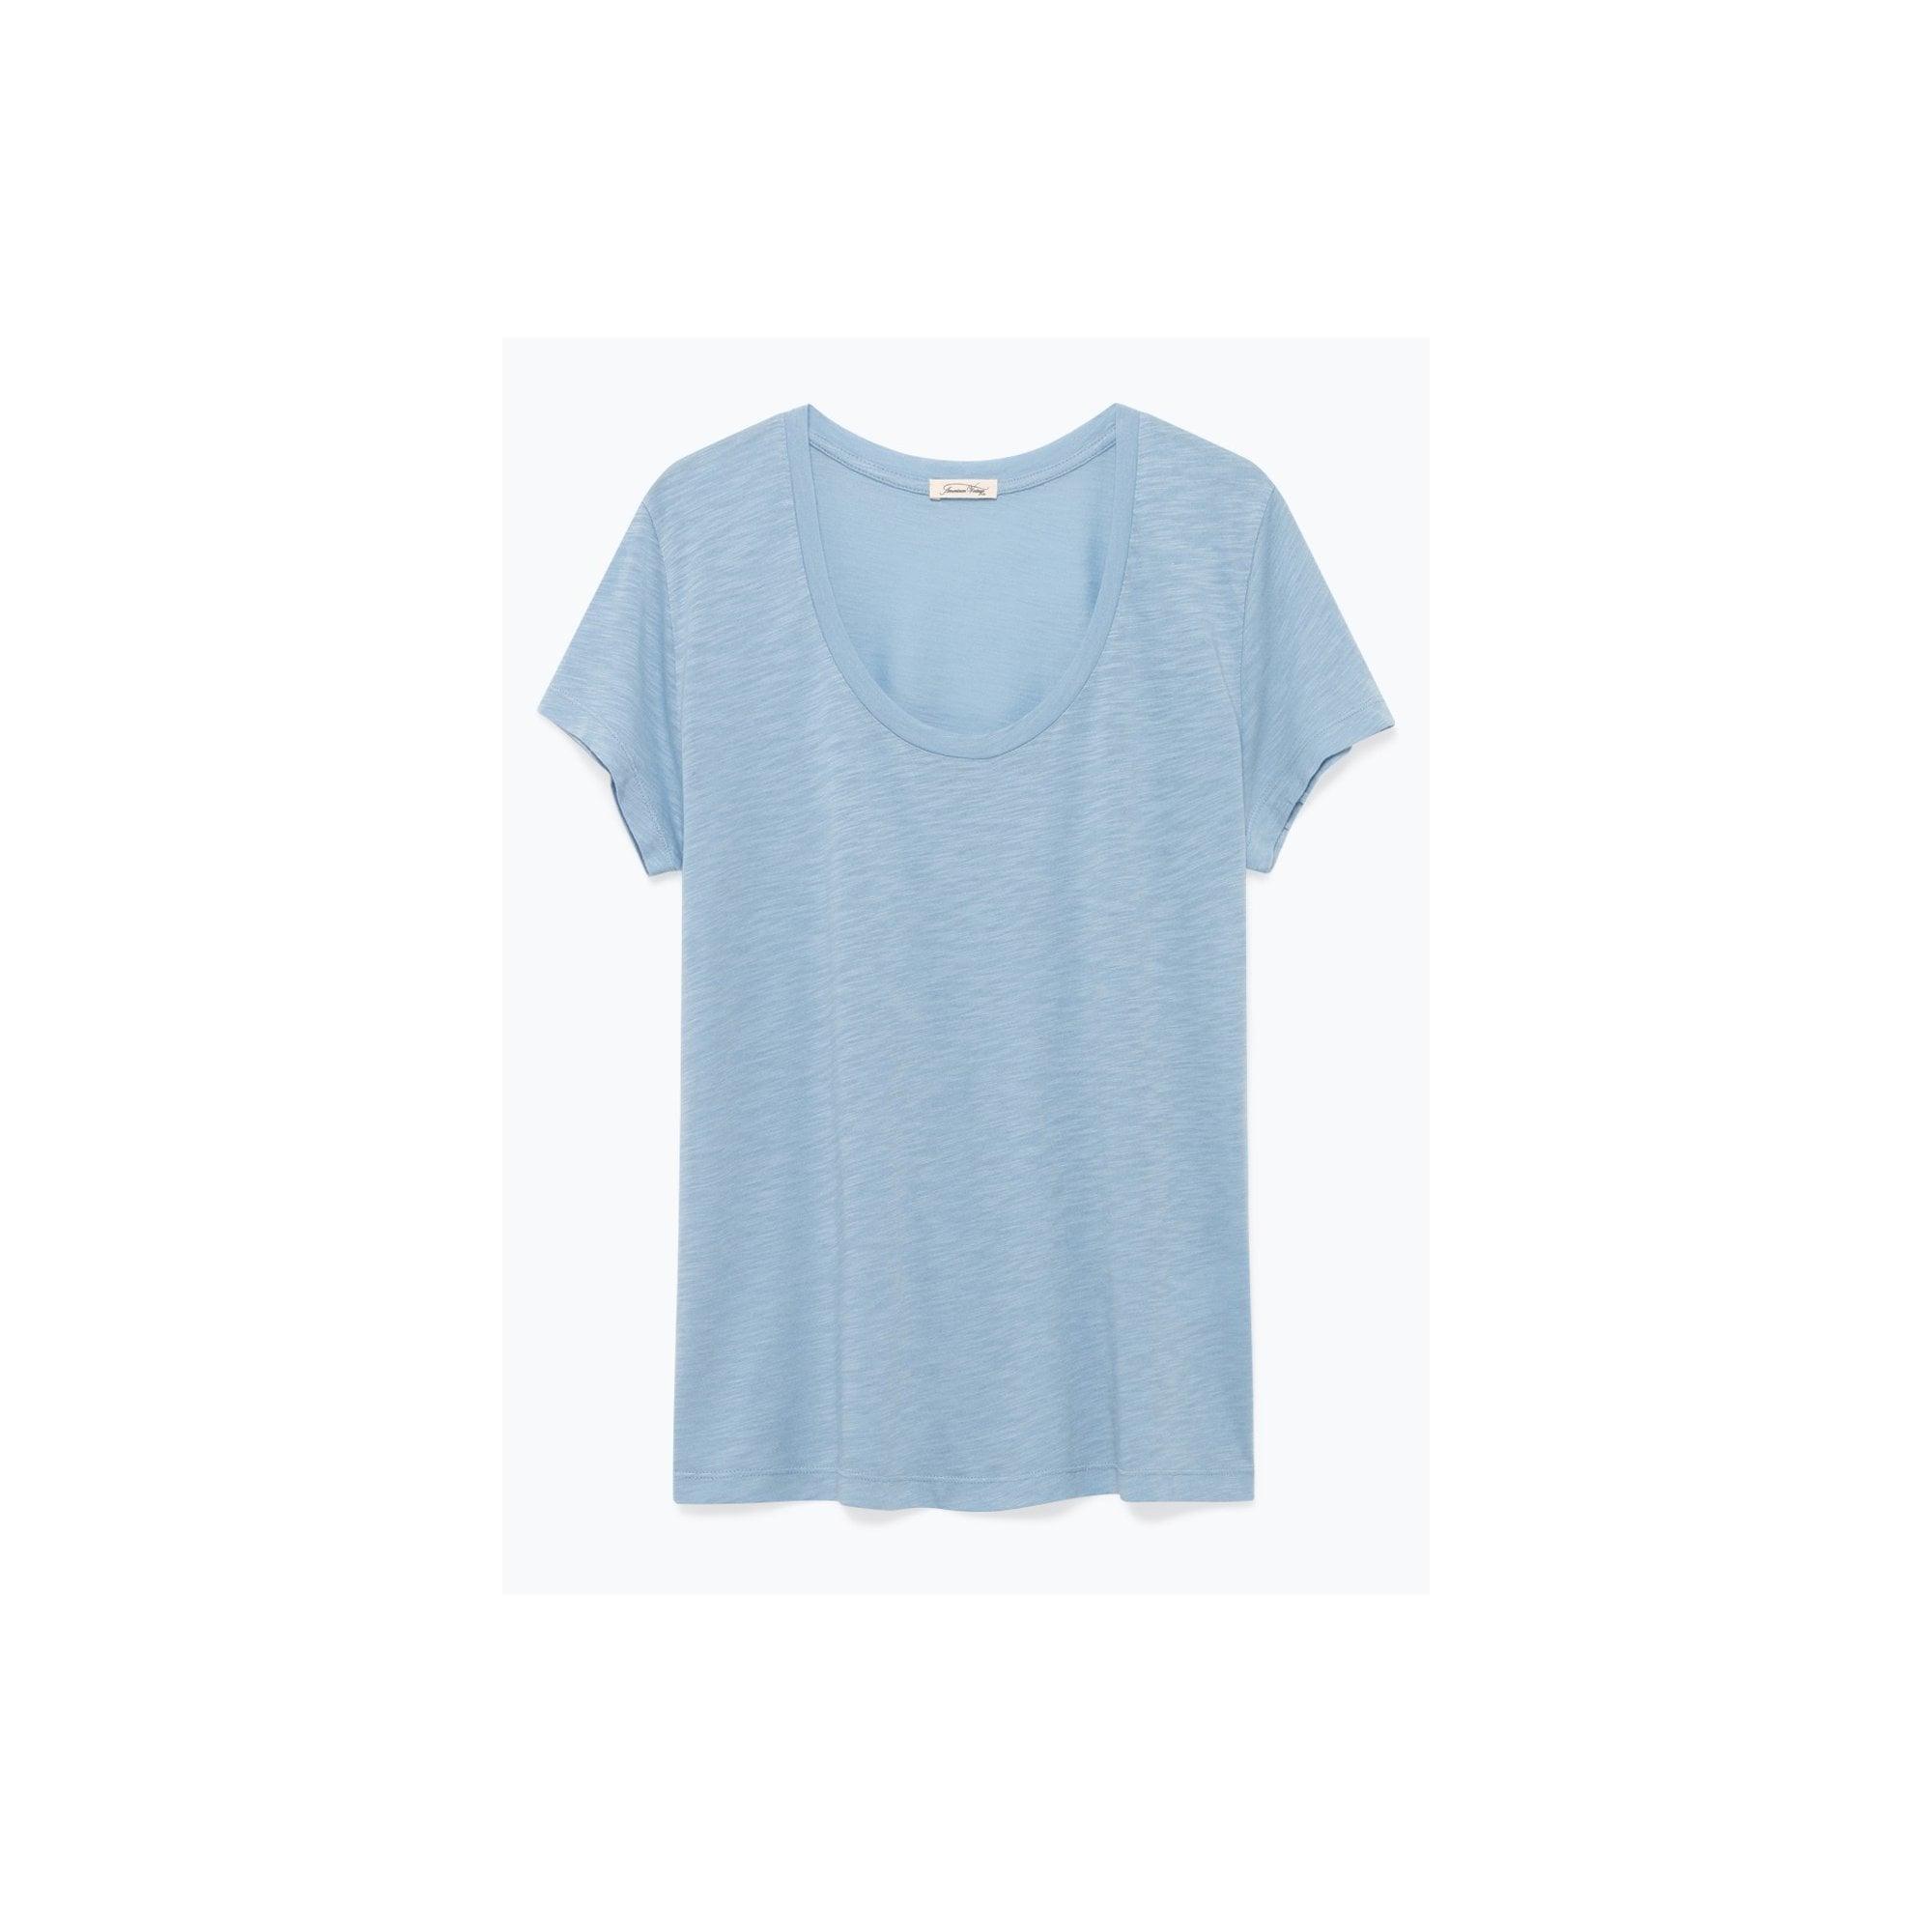 928fcedc Jacksonville T Shirt in Sky | Collen & Clare